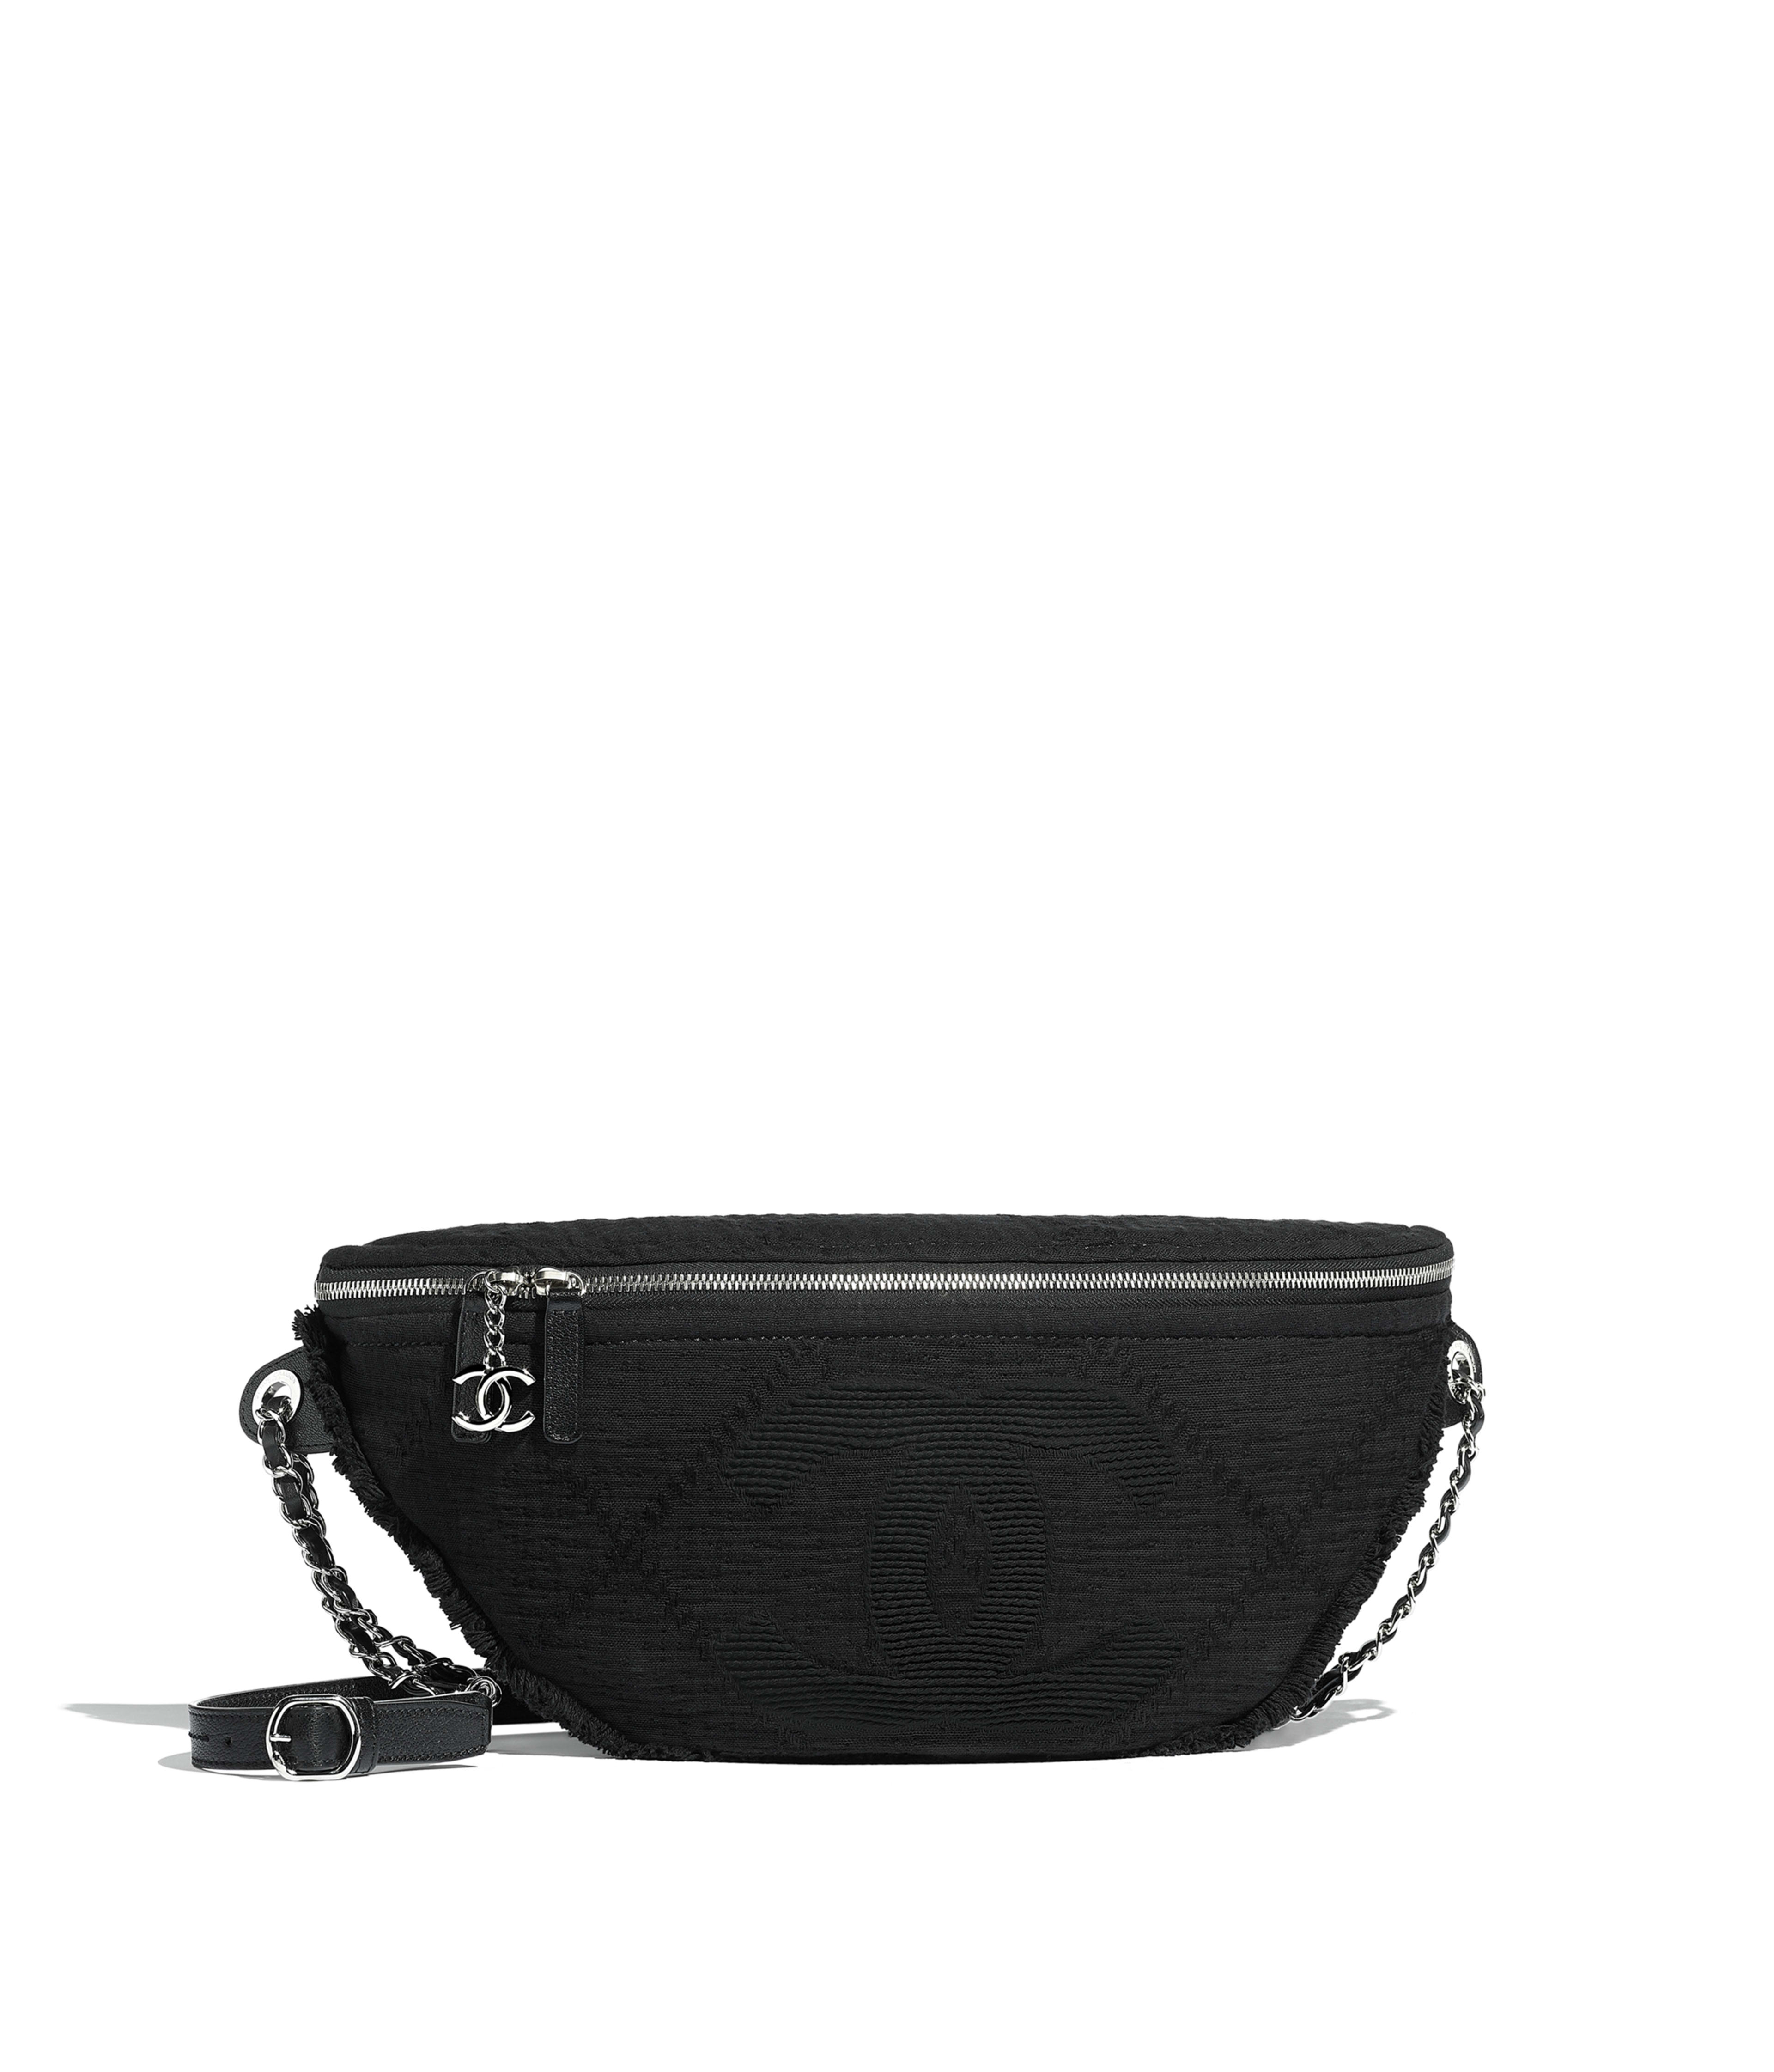 a1068251c057a0 Waist Bag Mixed Fibers, Goatskin, Silver-Tone Metal, Black Ref.  AS0315B0010794305